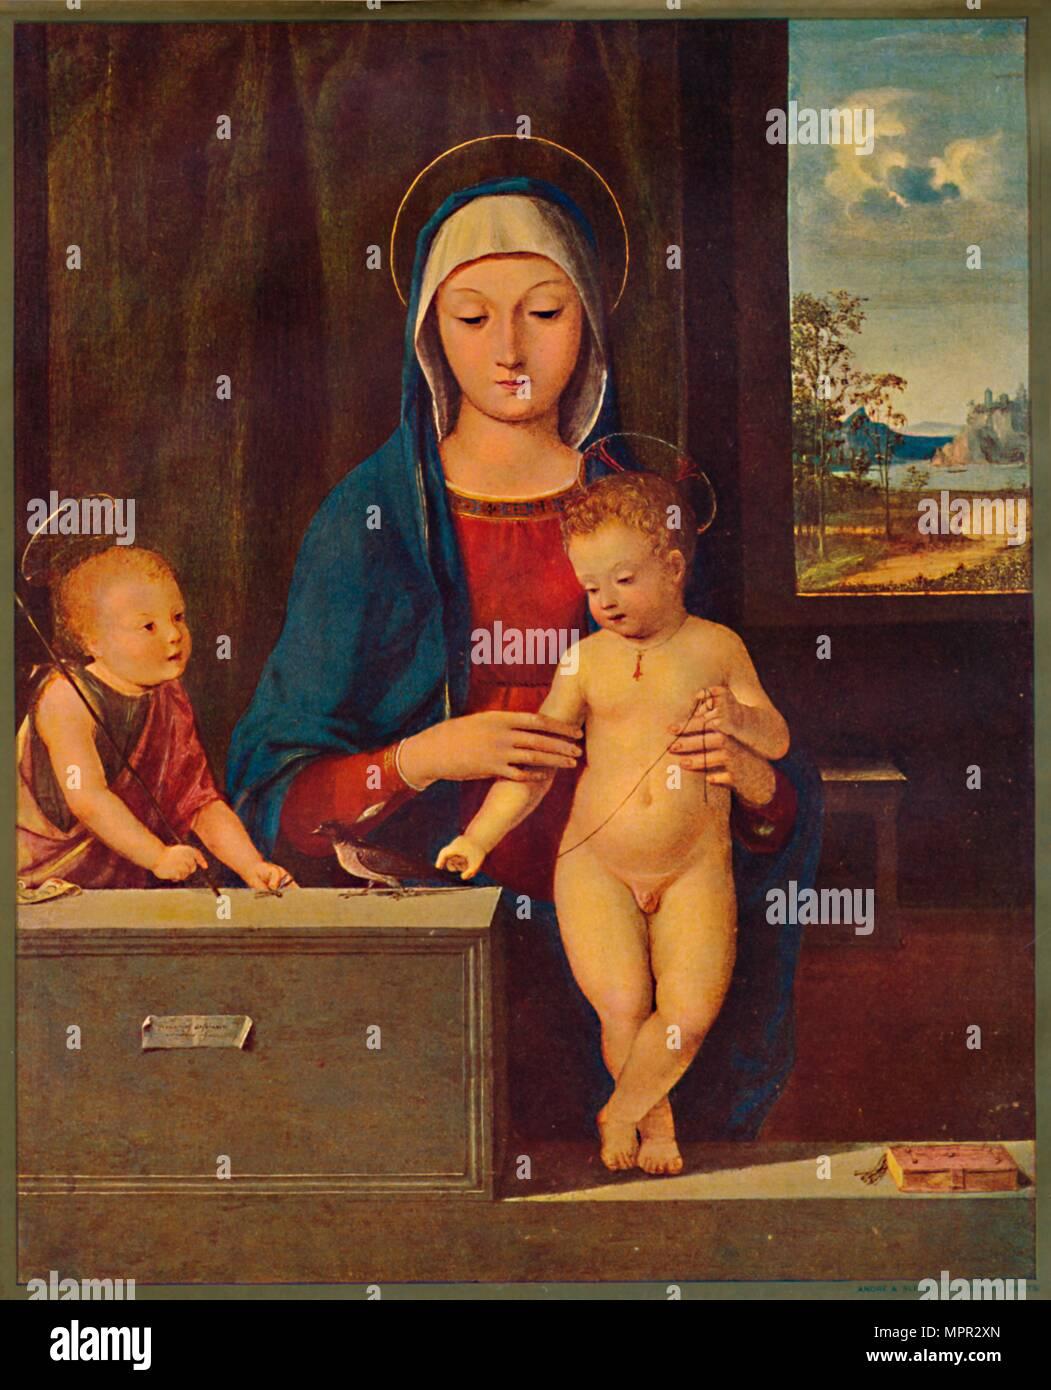 'Madonna and Child with St. John the Baptist', 1903. Artist: Antonio Solario. - Stock Image